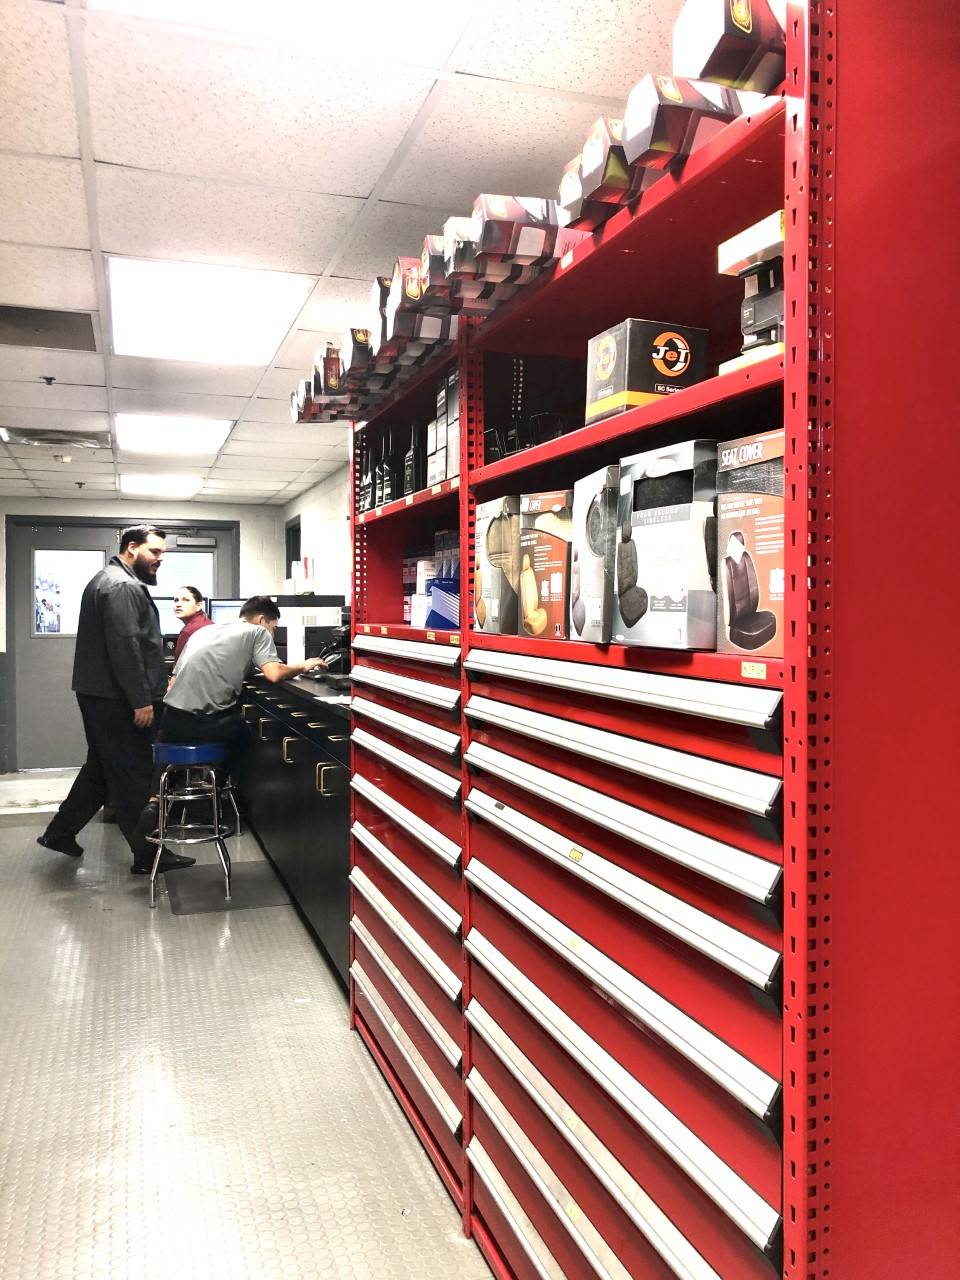 Universal Hyundai Parts Center - car repair  | Photo 2 of 10 | Address: 12801 S Orange Blossom Trail, Orlando, FL 32837, USA | Phone: (407) 545-8495